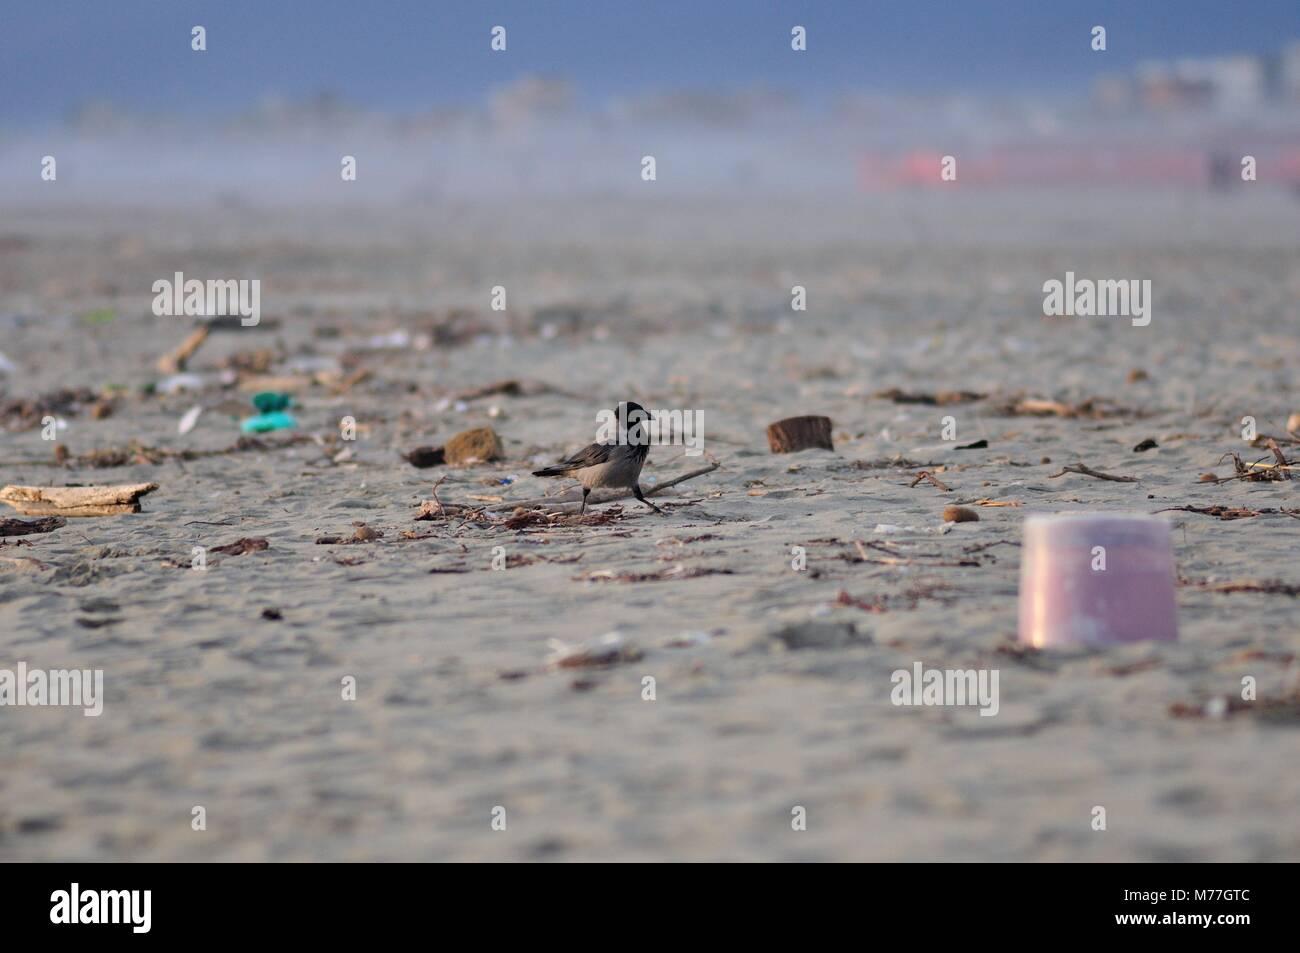 A bird in a dirty beach. - Stock Image